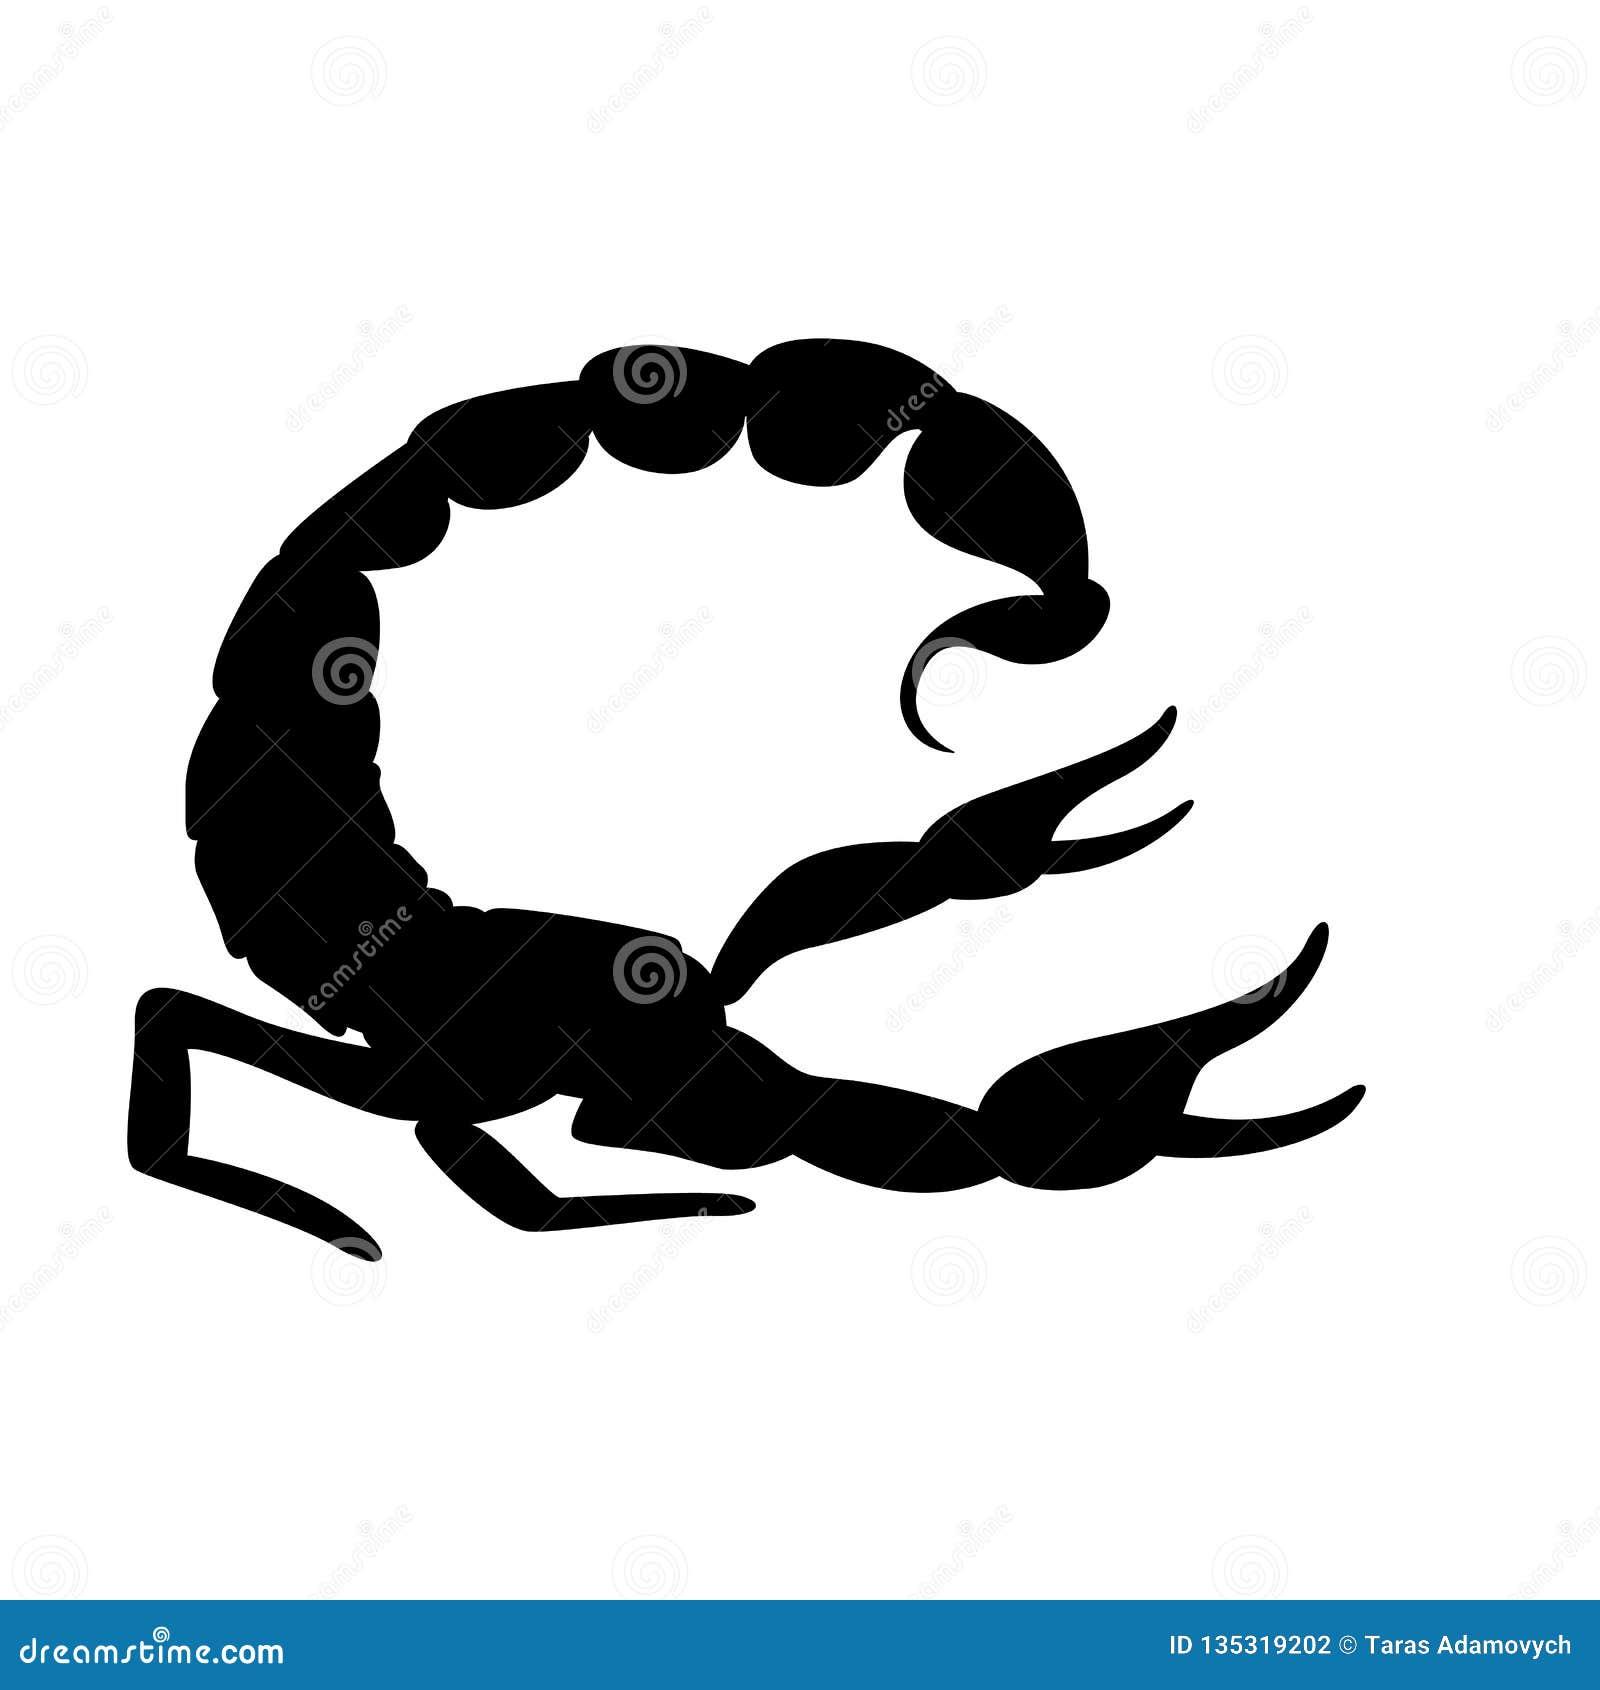 Scorpio Vector Illustration Black Silhouette Profile Stock Vector Illustration Of Silhouette Clipart 135319202